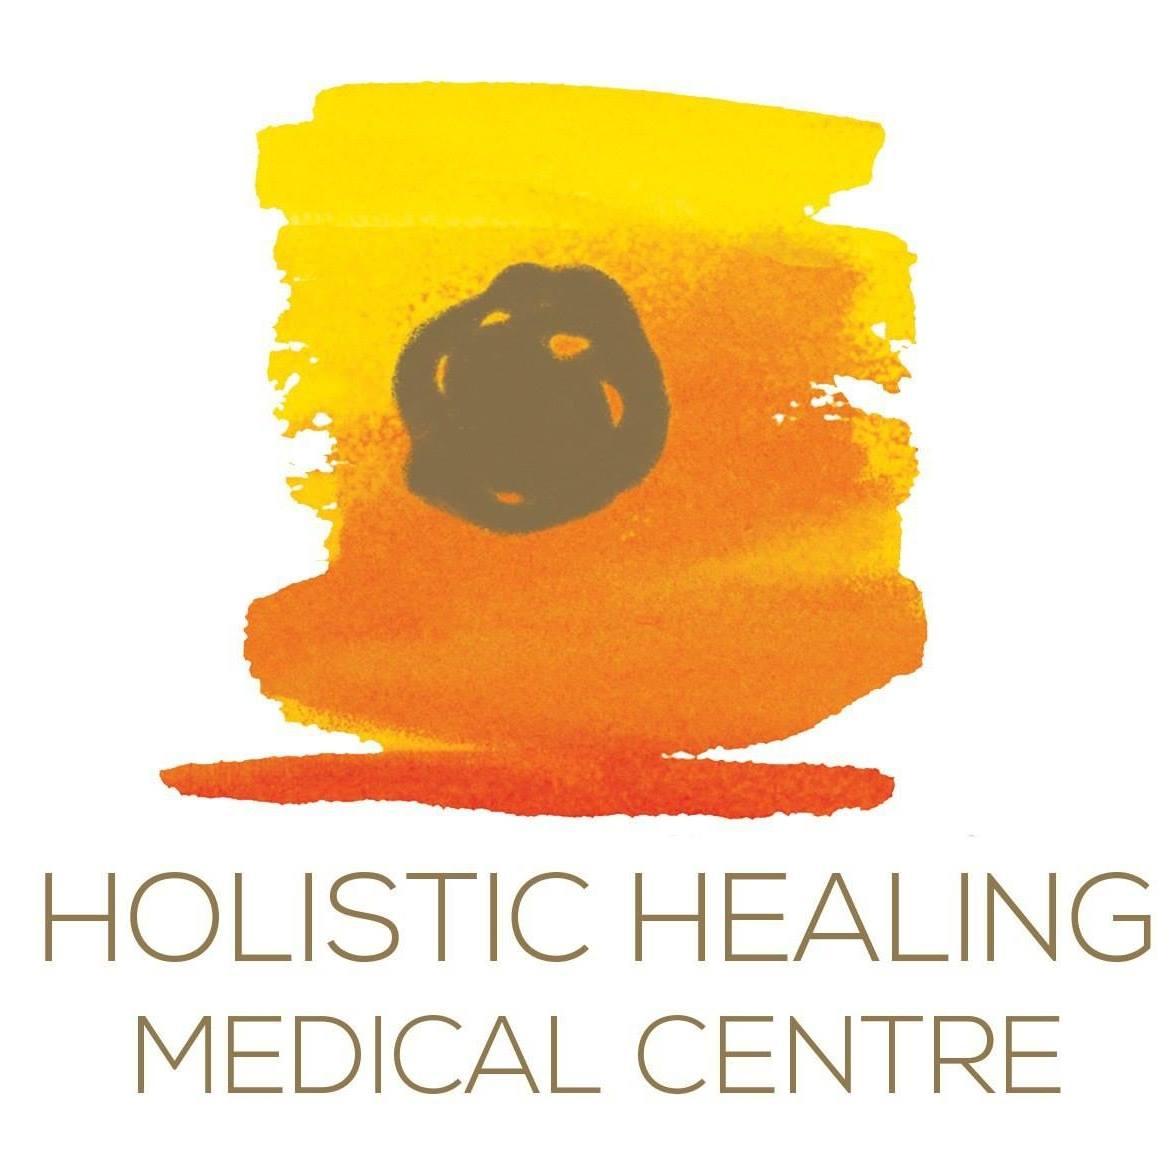 Holistic Healing Medical Centre